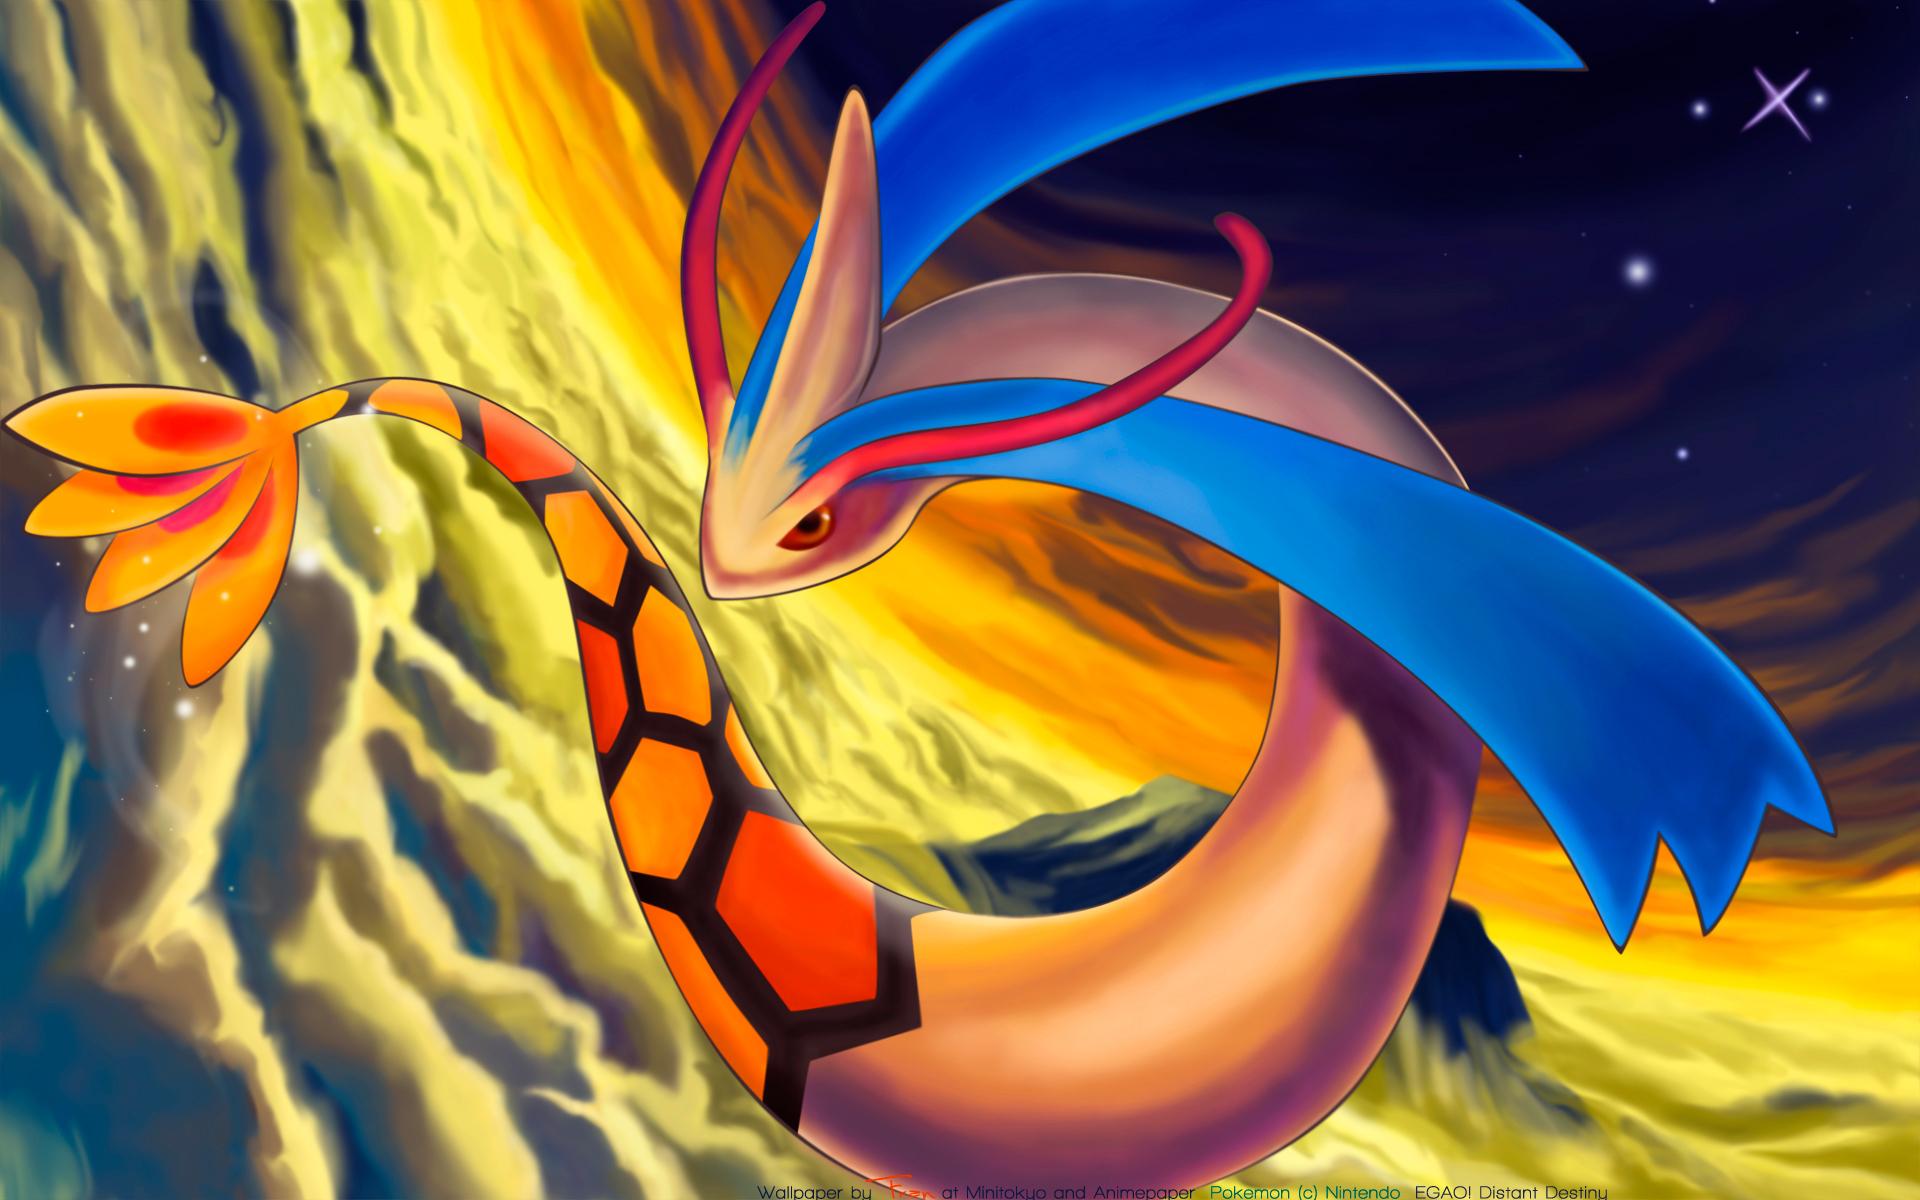 Shiny Milotic Oras Pokemon Hd Wallpaper Download High Quality